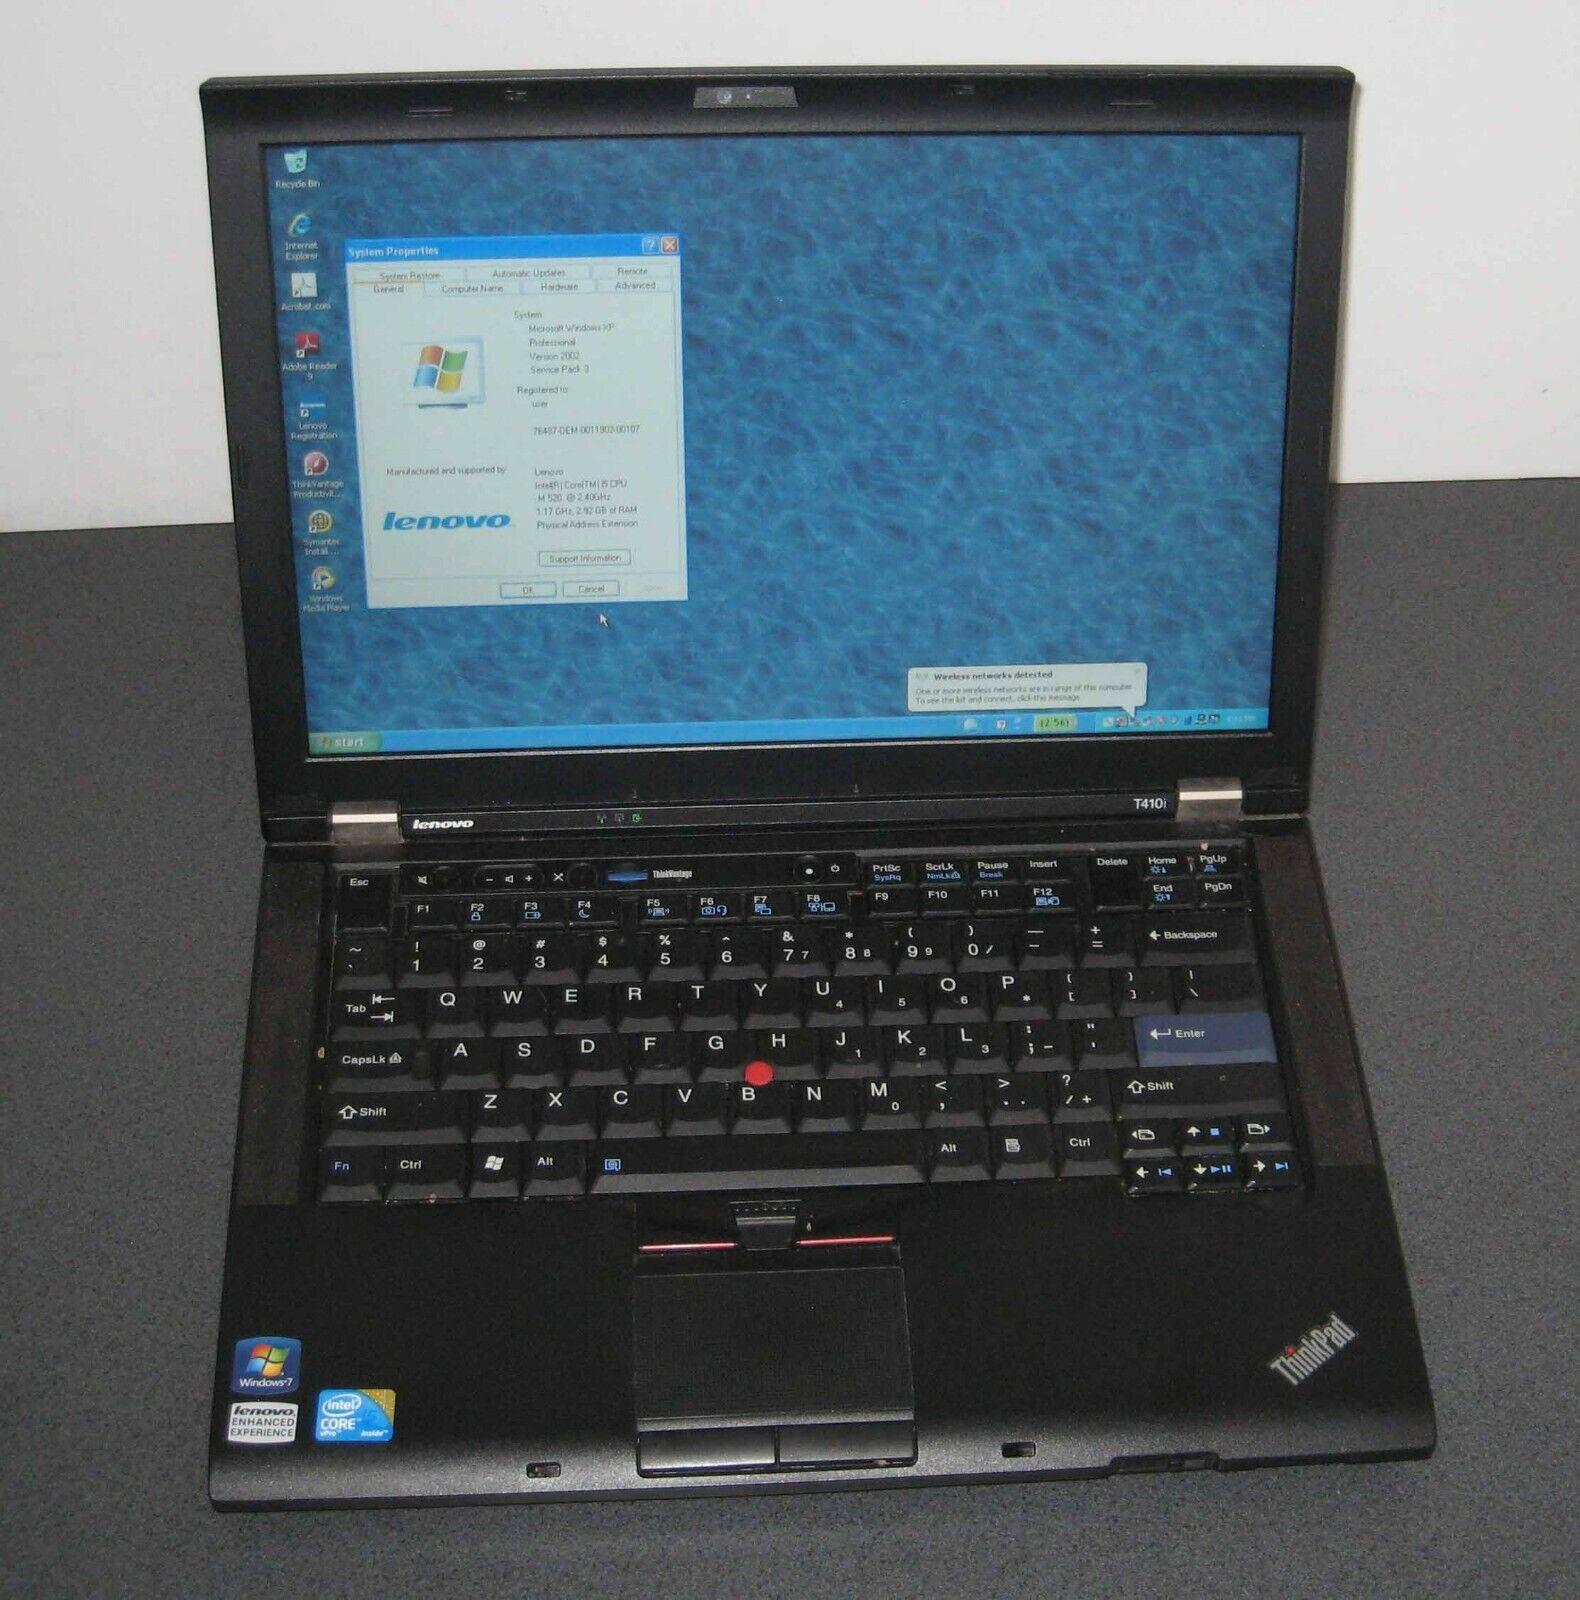 "Laptop Windows - Lenovo ThinkPad T410 14.1"" Intel Core i5 520M 4GB RAM Windows XP Pro"